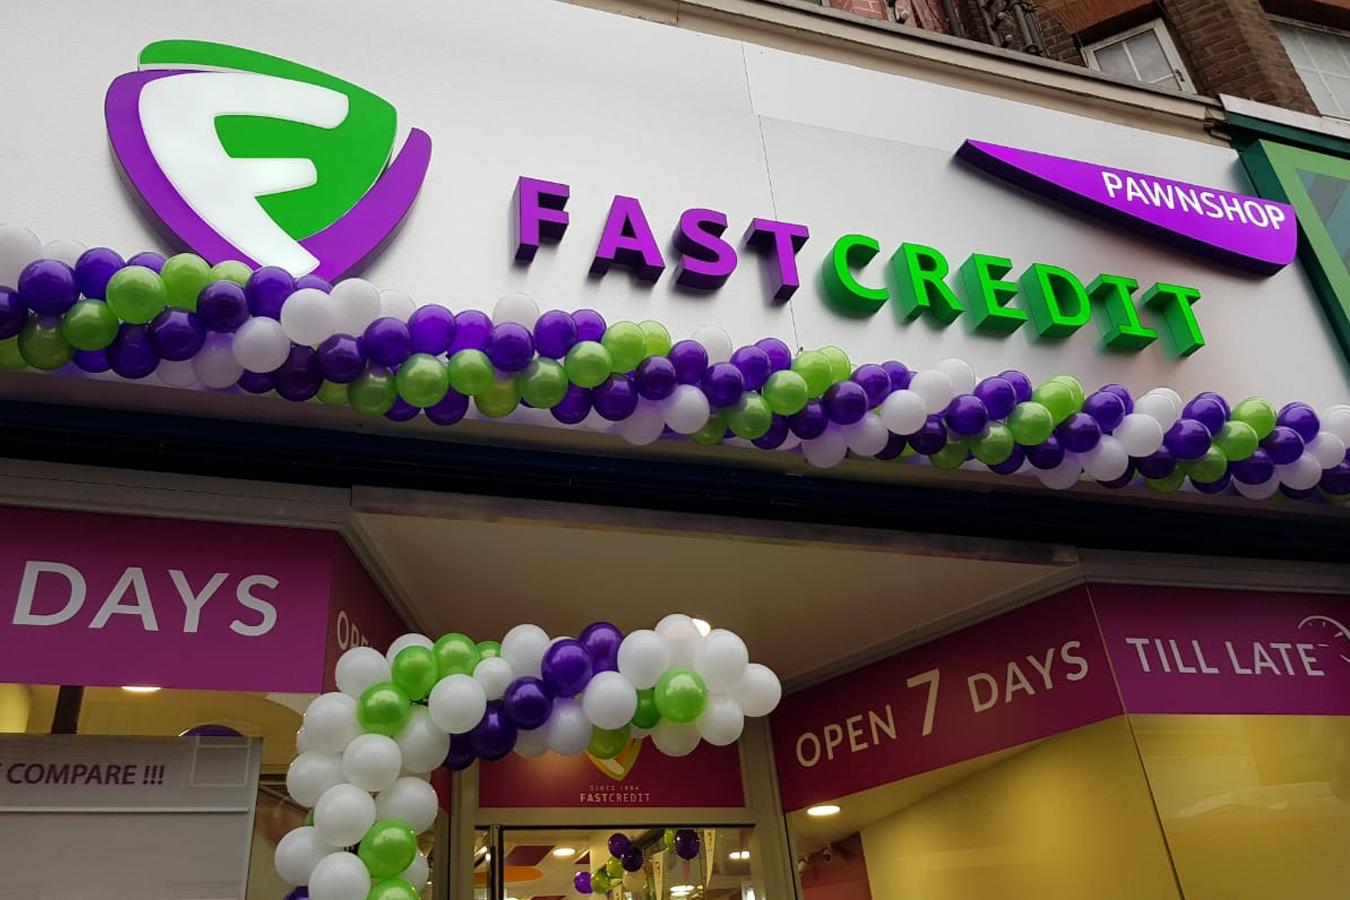 Why choose Fast Credit UK?